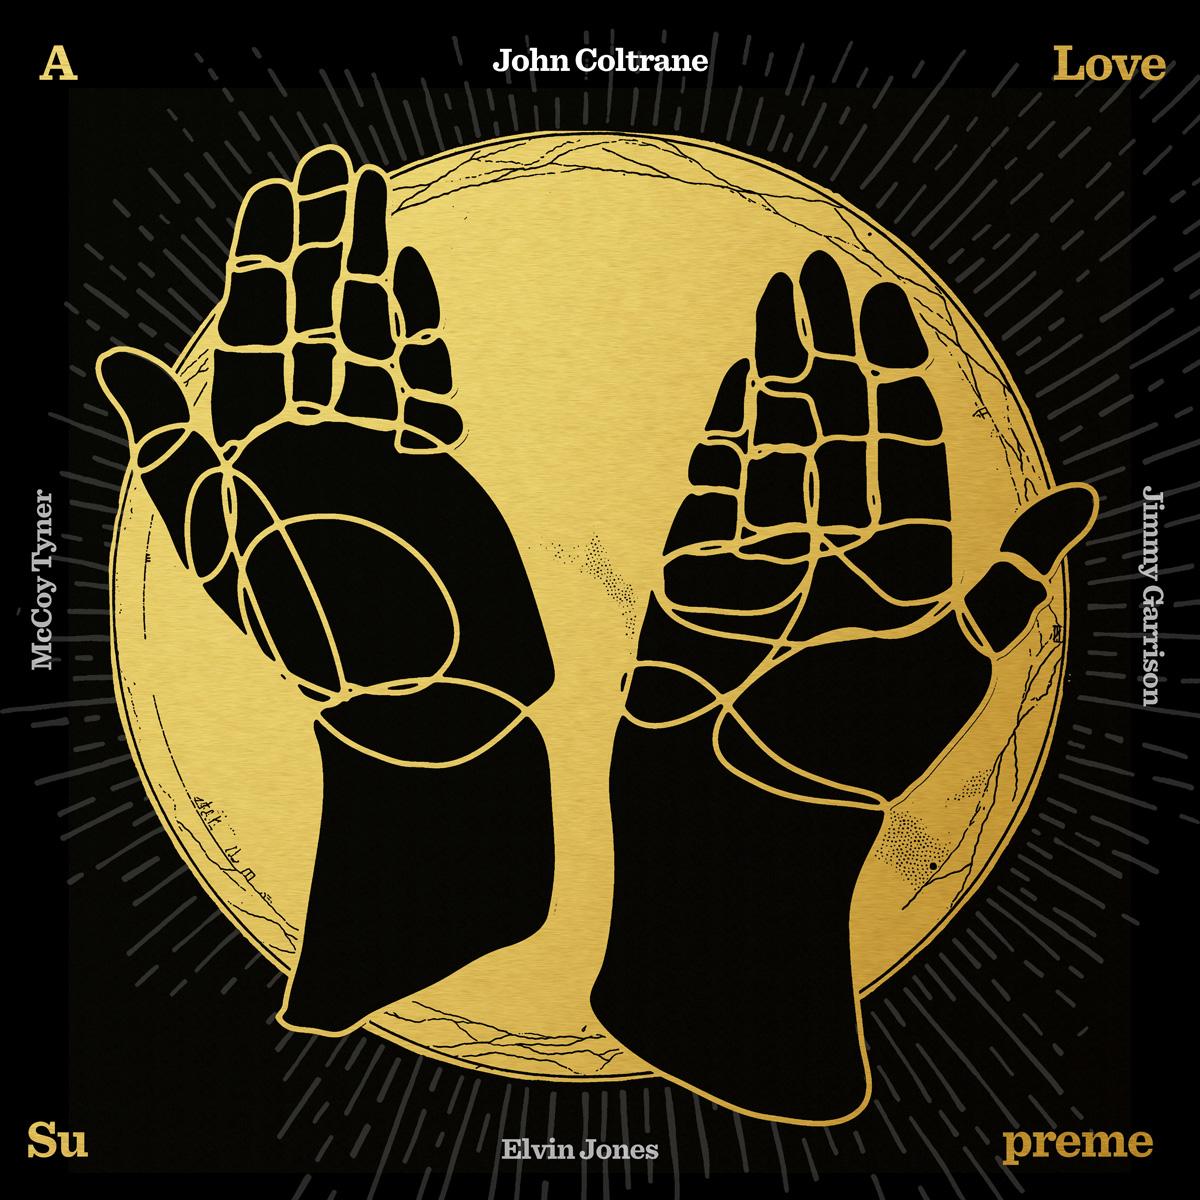 Donal Thornton's re-imagining of John Coltrane's Love Supreme.